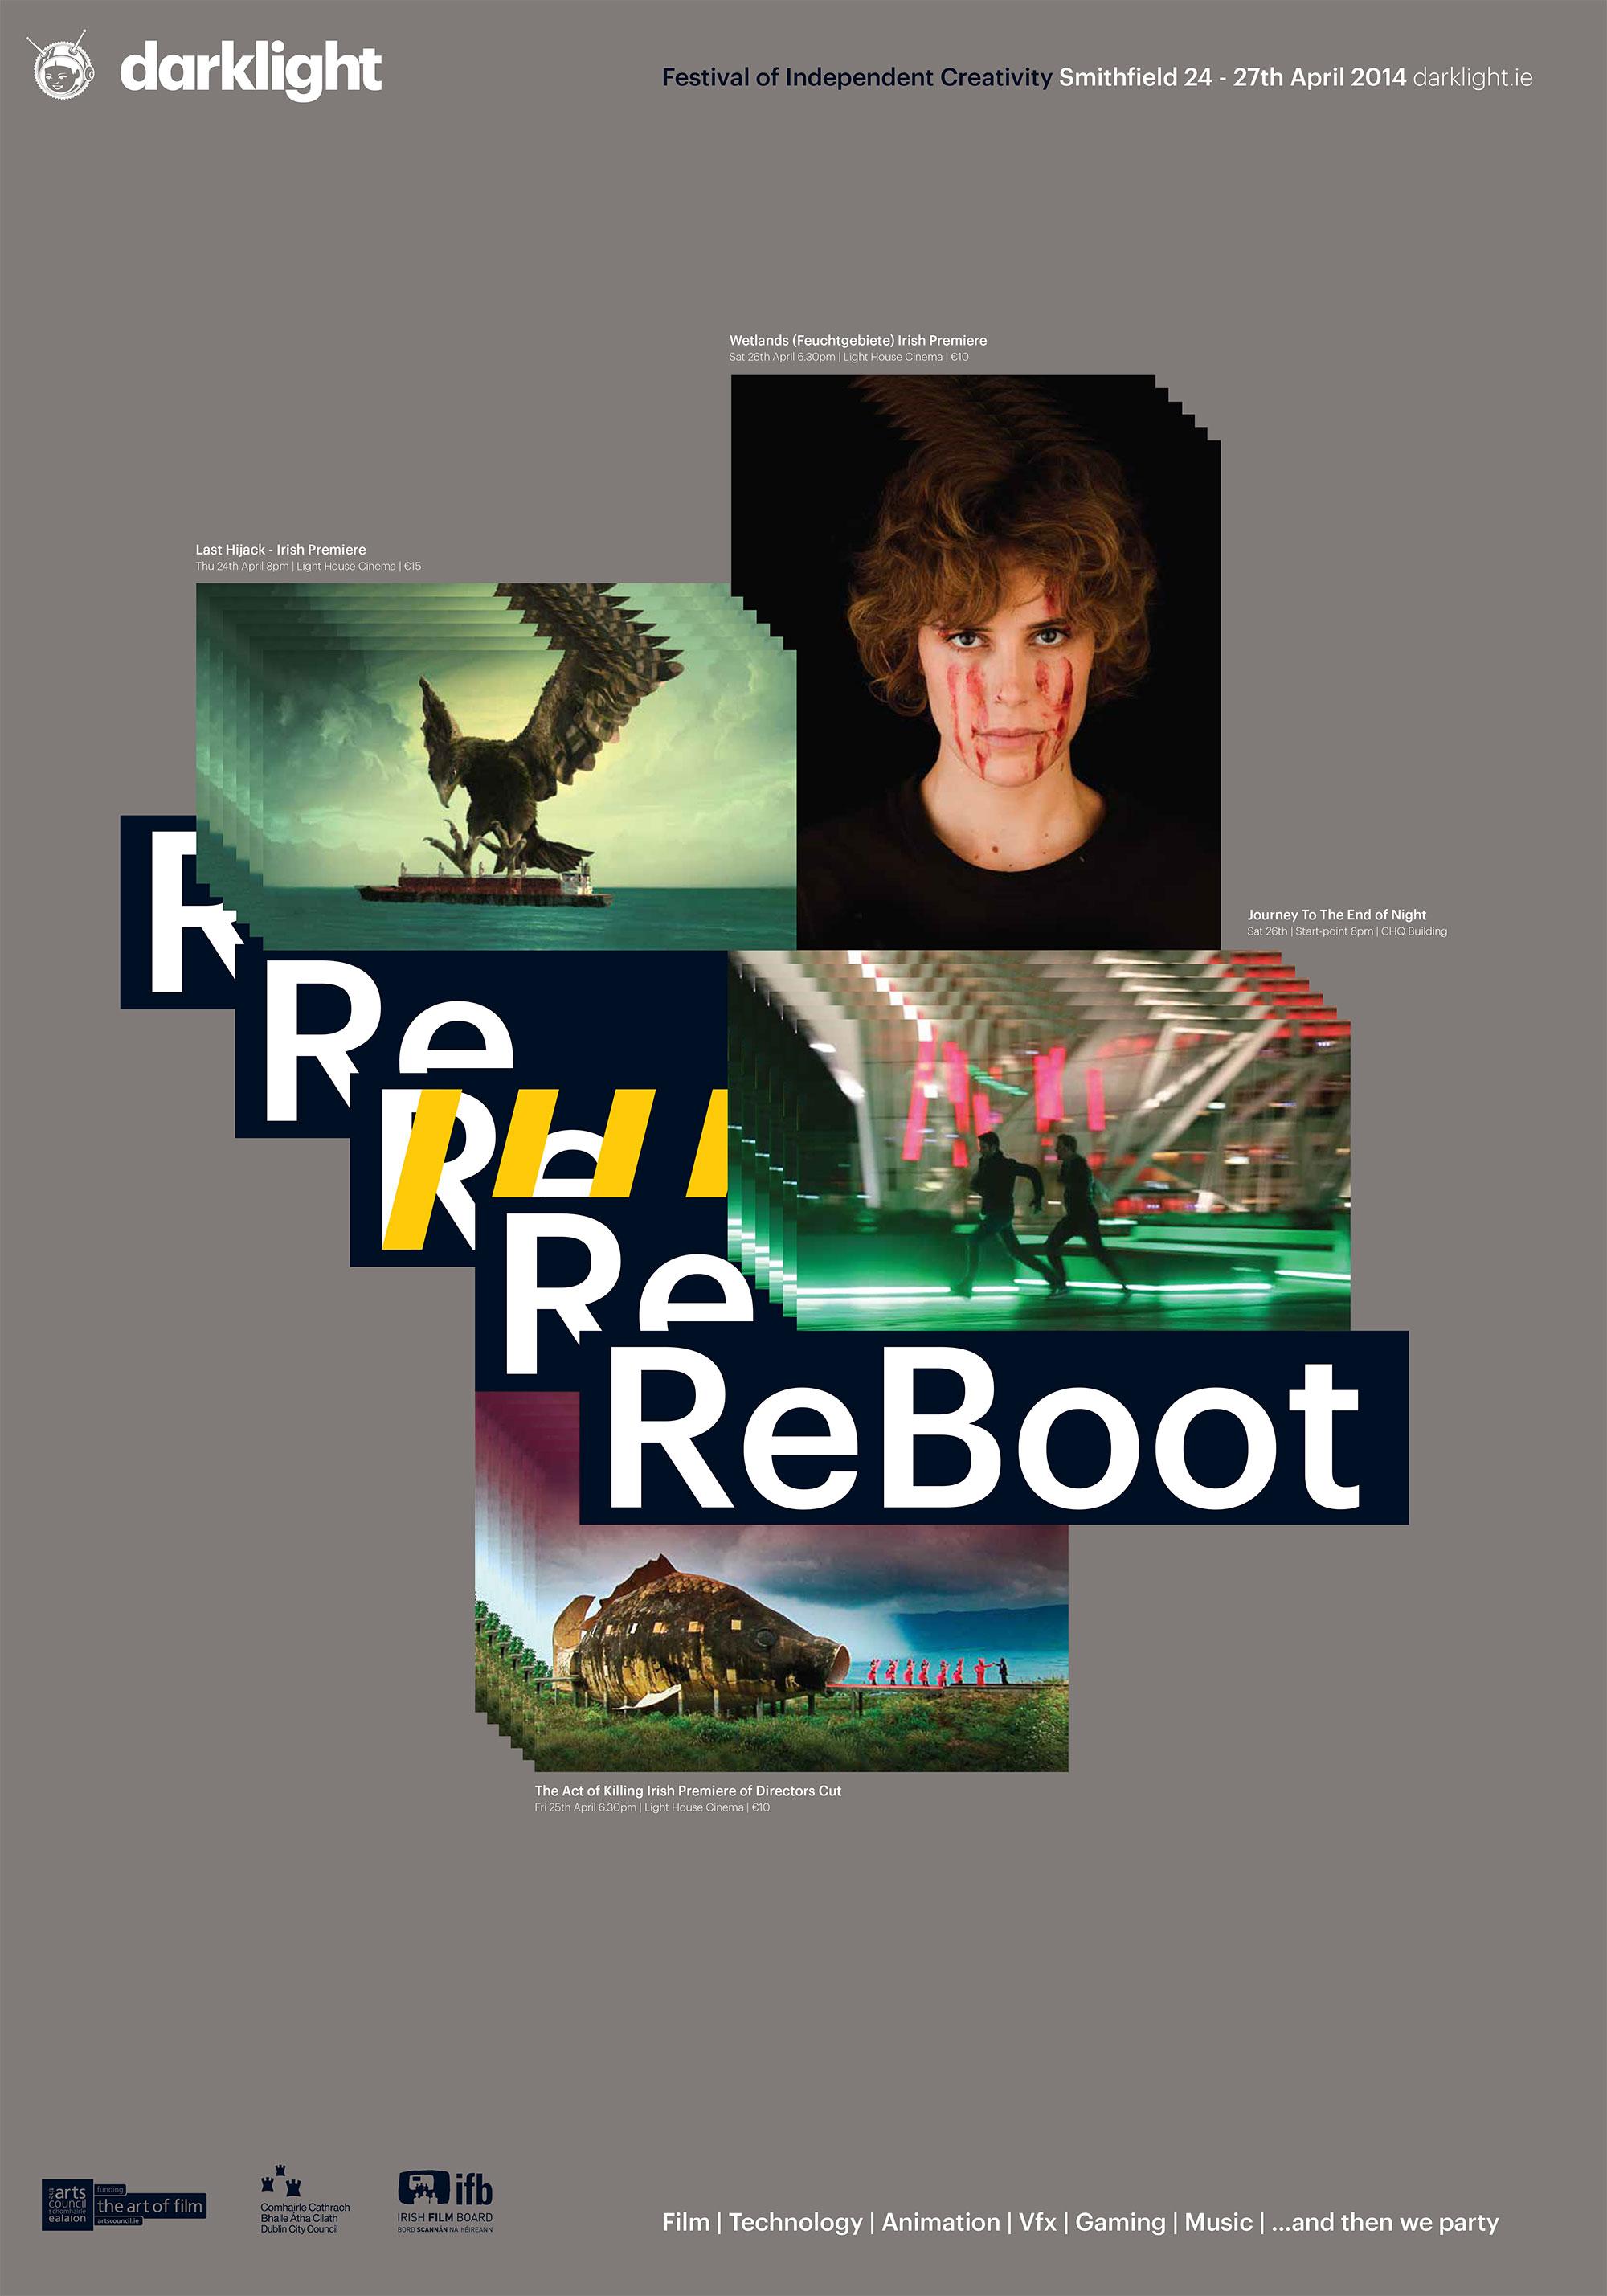 Cover image: Darklight Reboot